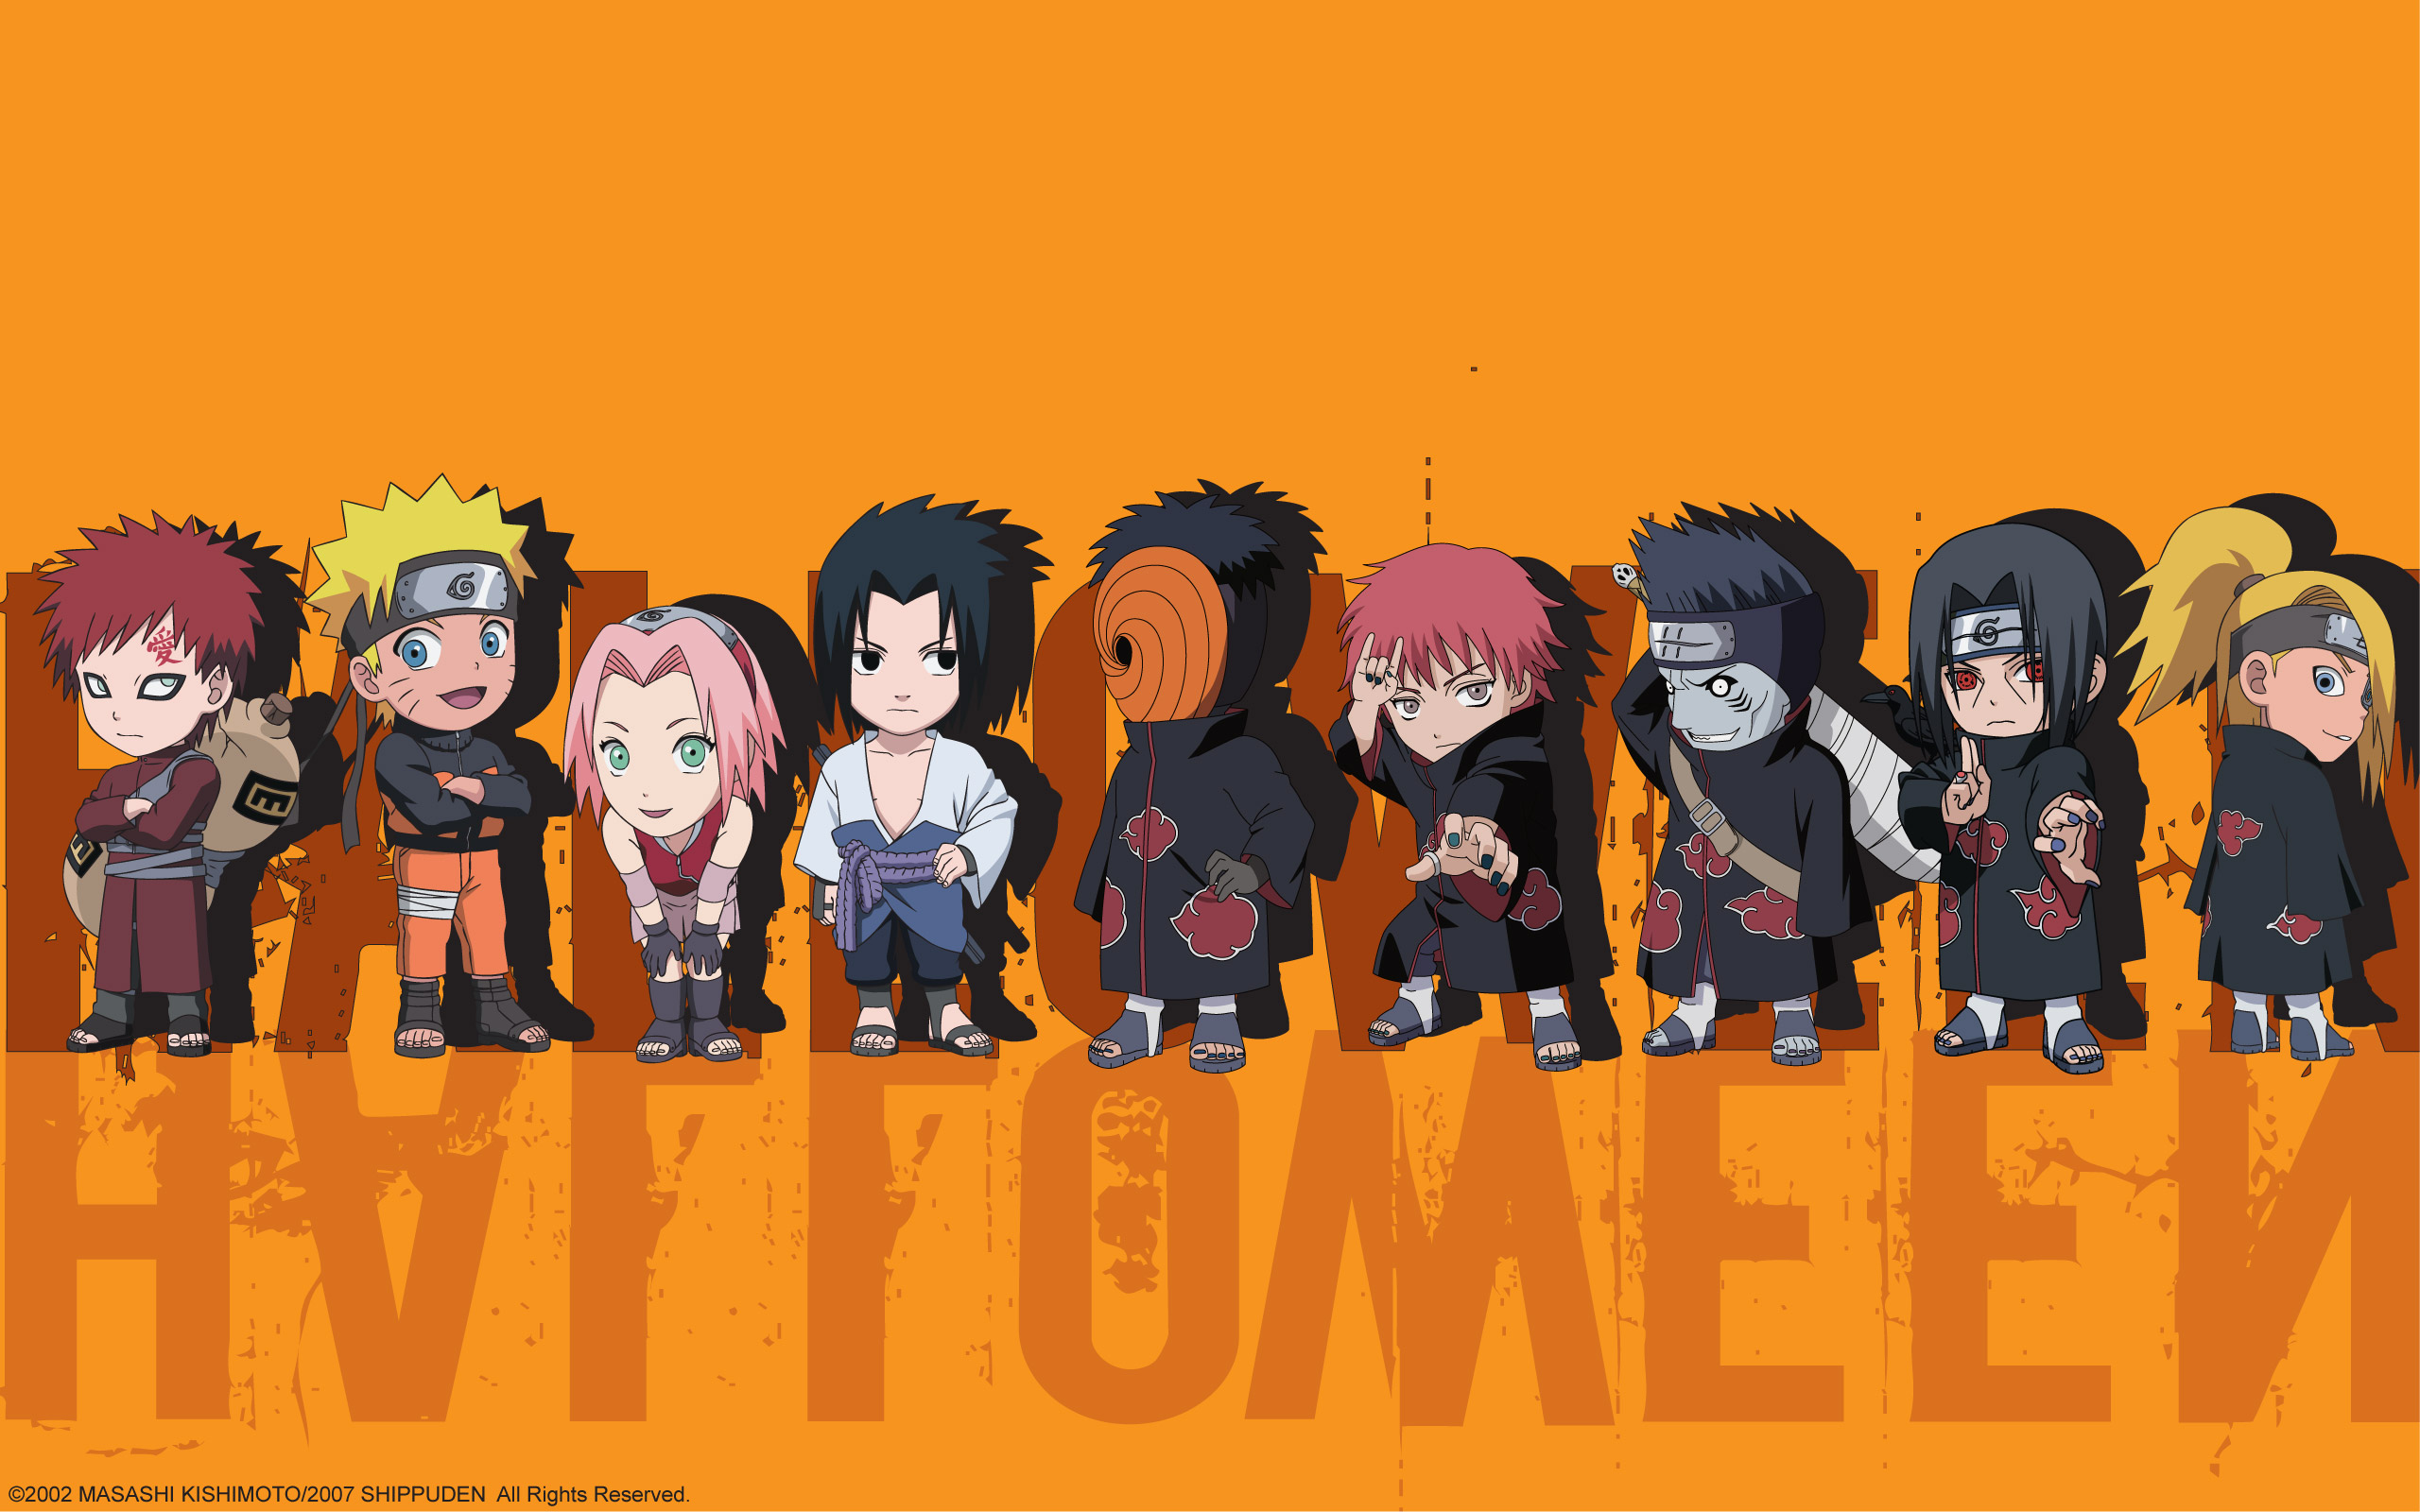 Download Naruto Shippuden Chibis Uchiha Obito Wallpaper 2560x1600